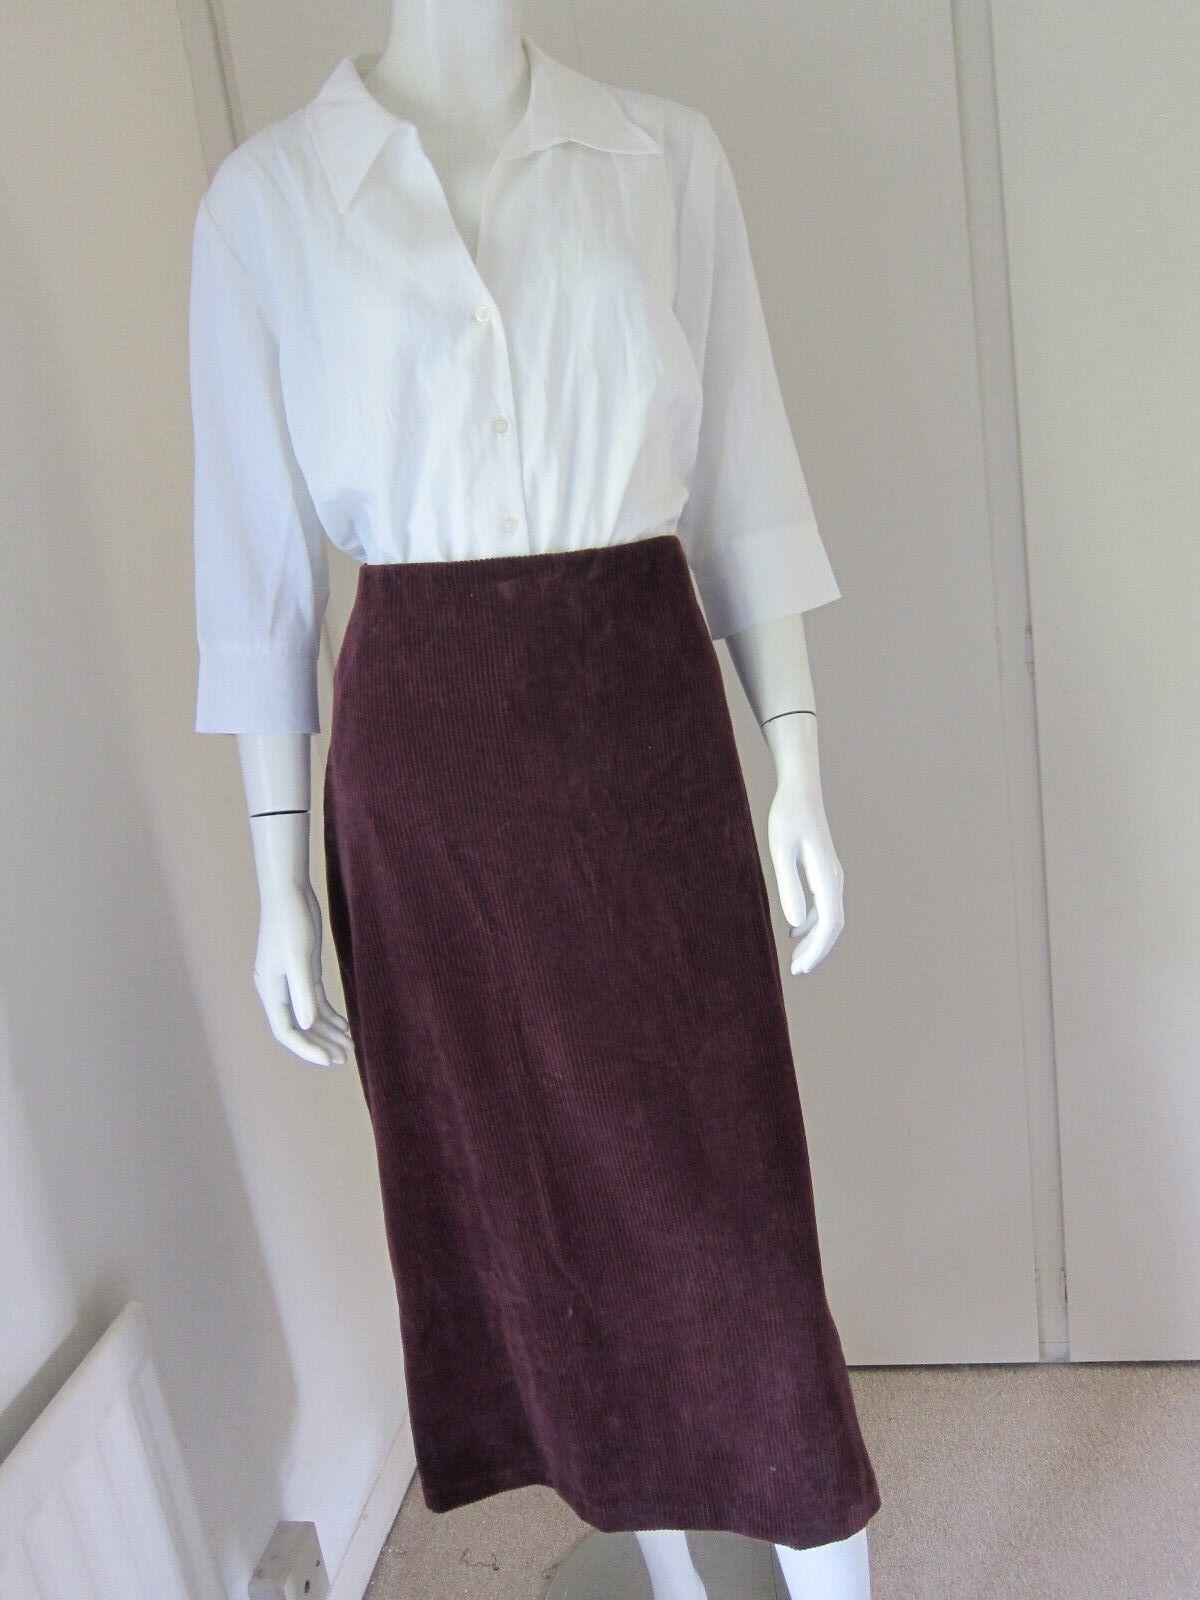 David Nieper. Maroon Skirt Size Large. 32 . Cotton corduroy